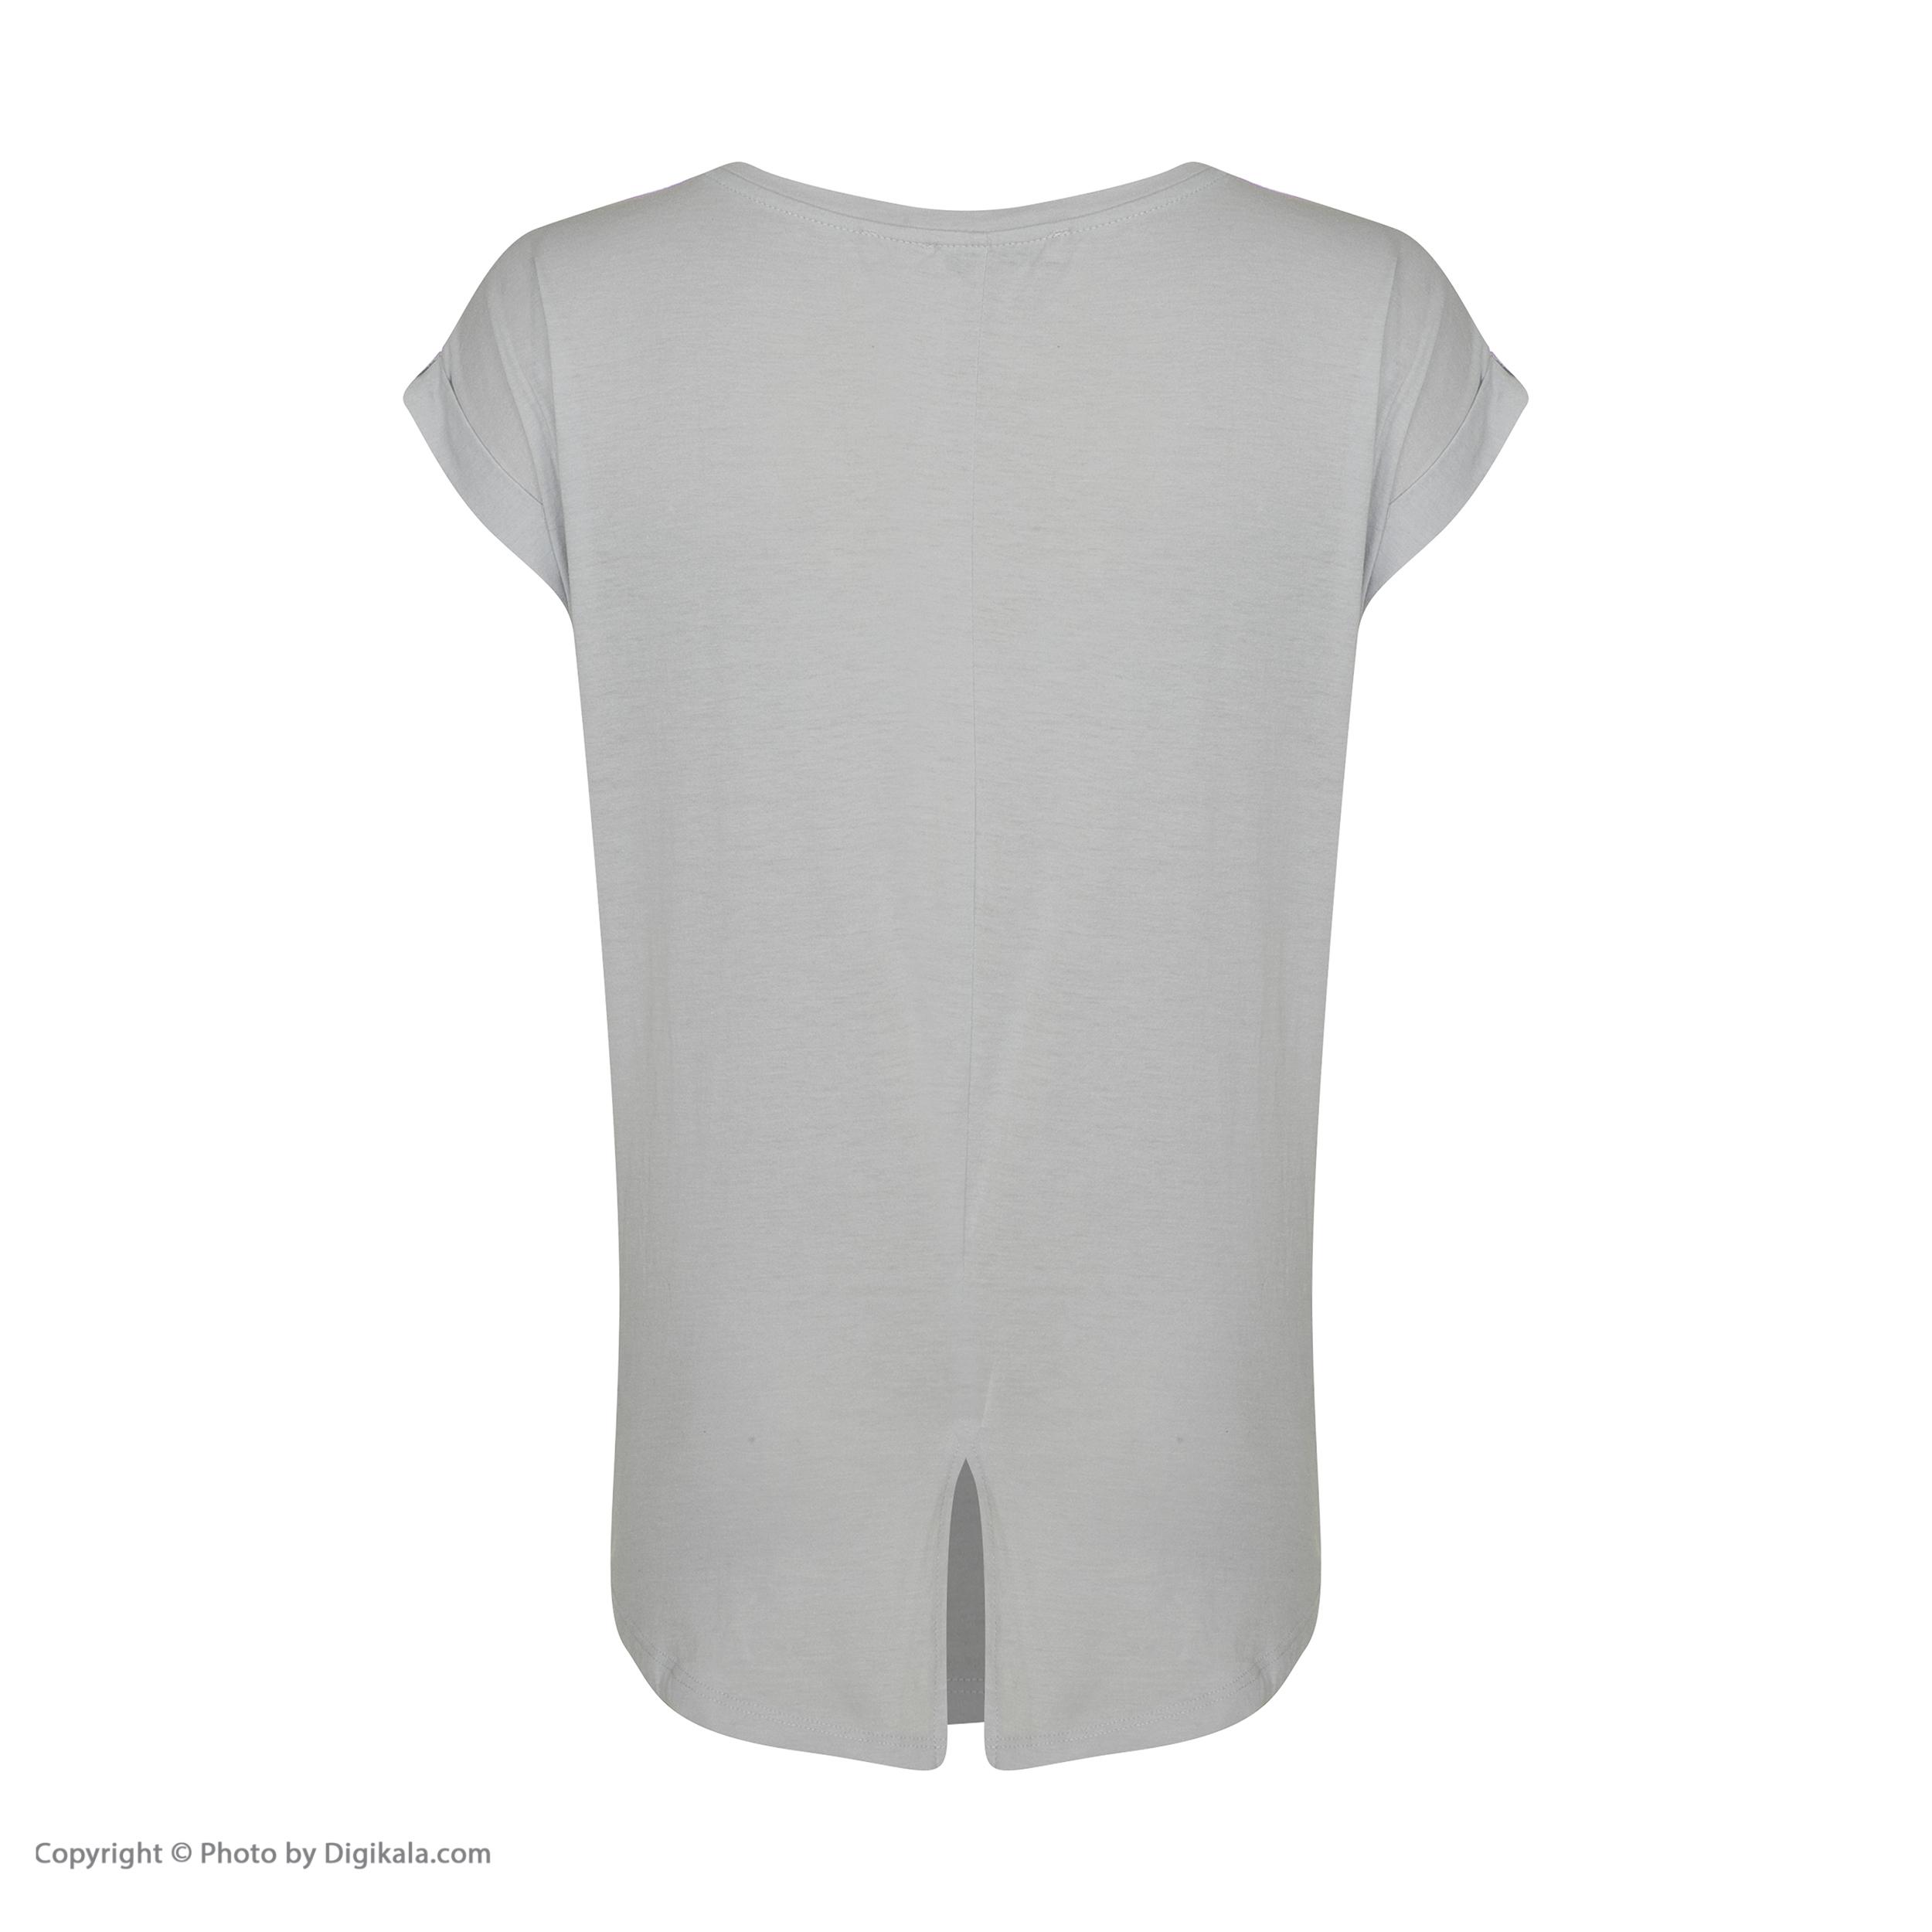 تی شرت زنانه کالینز مدل CL1033142-LIGHTBLUE main 1 3